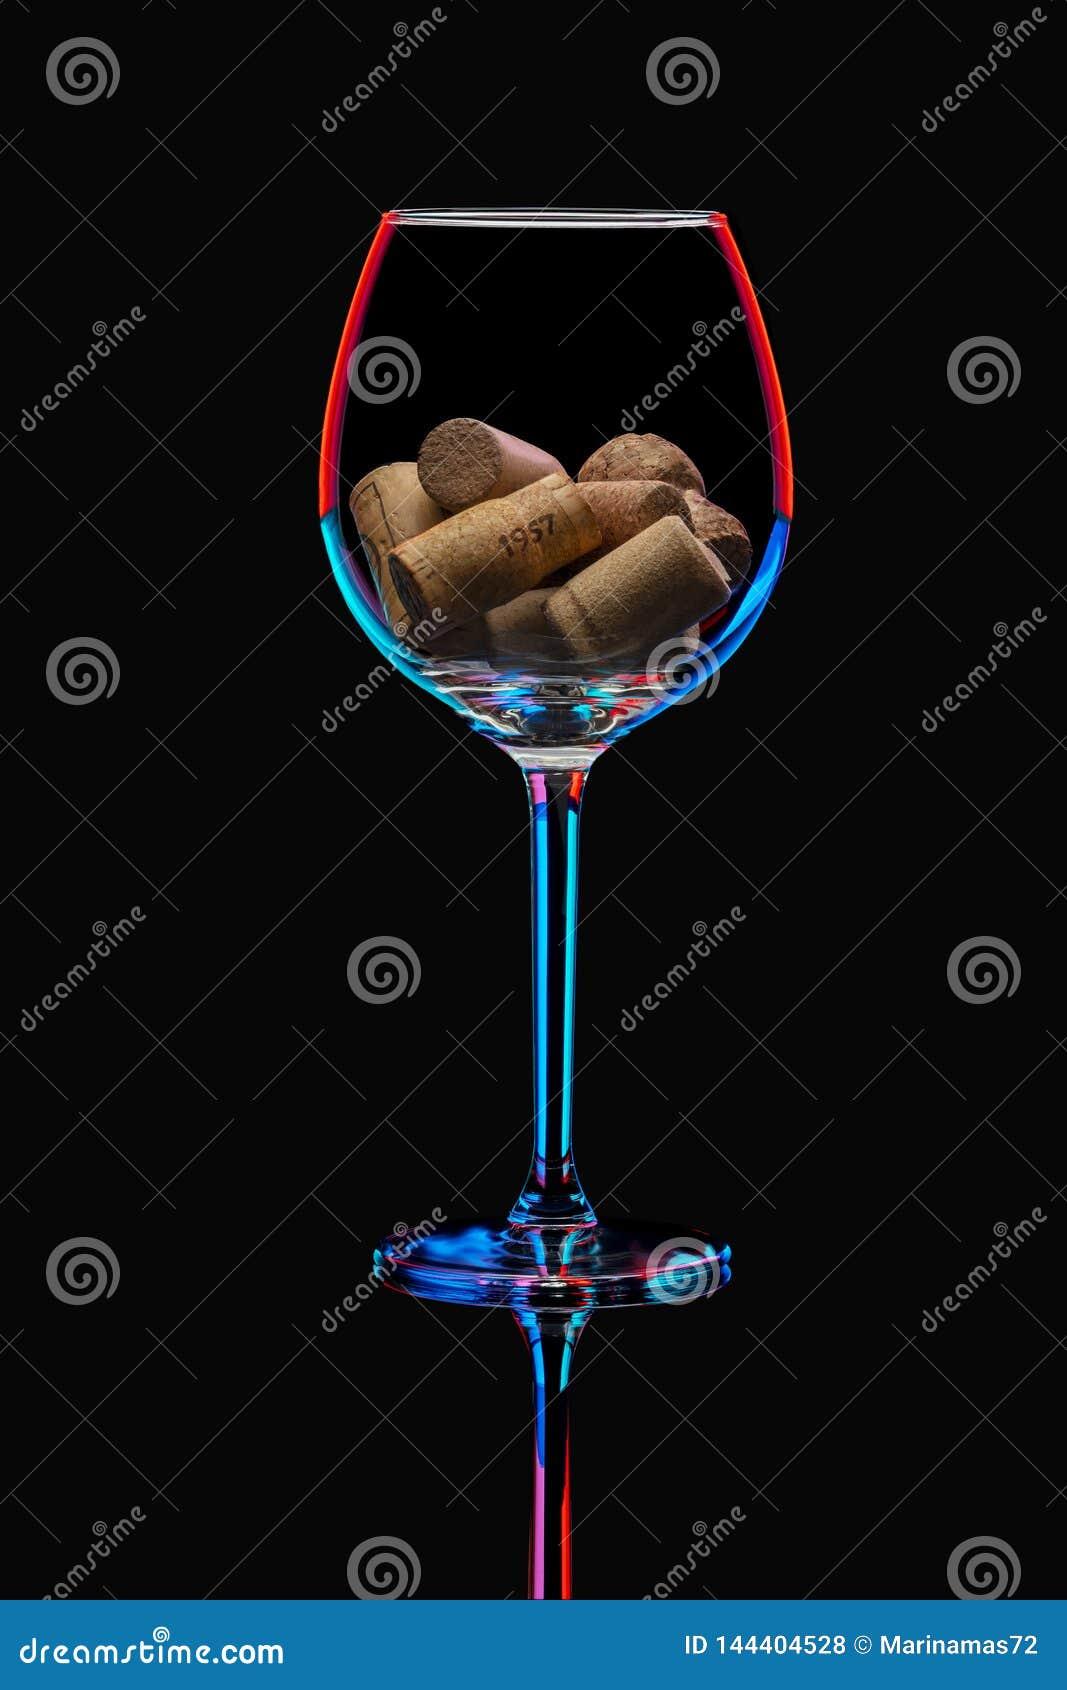 Wineglass in bright illumination